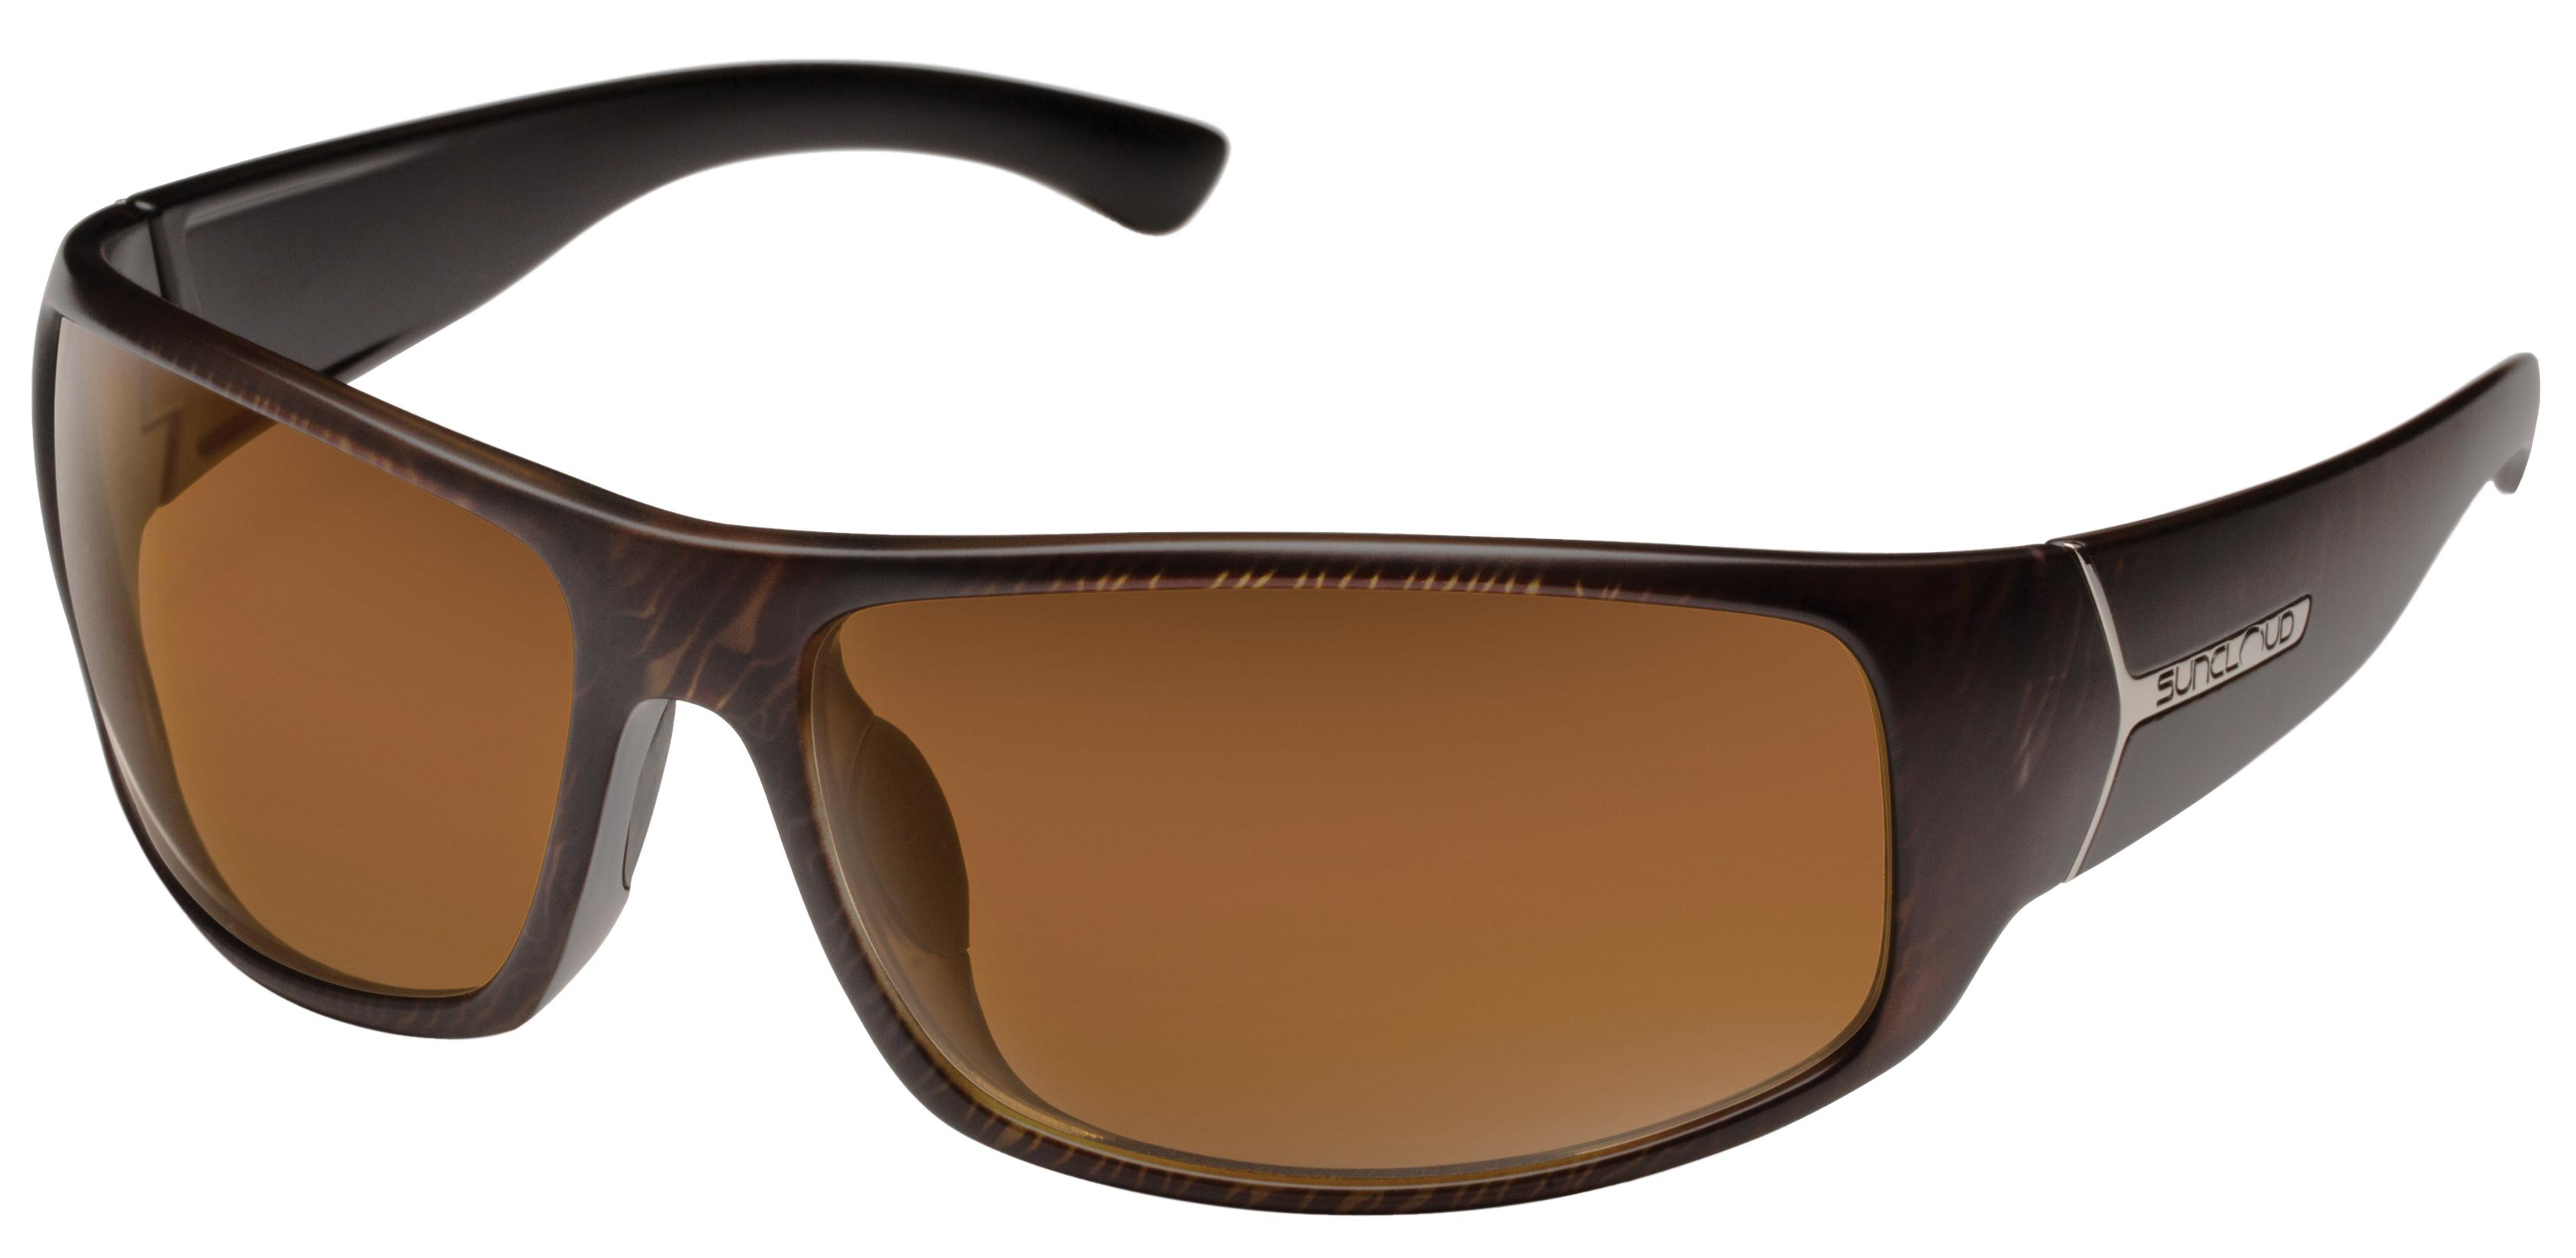 347a8307d11 Suncloud Turbine Polarized Sunglasses - Unisex